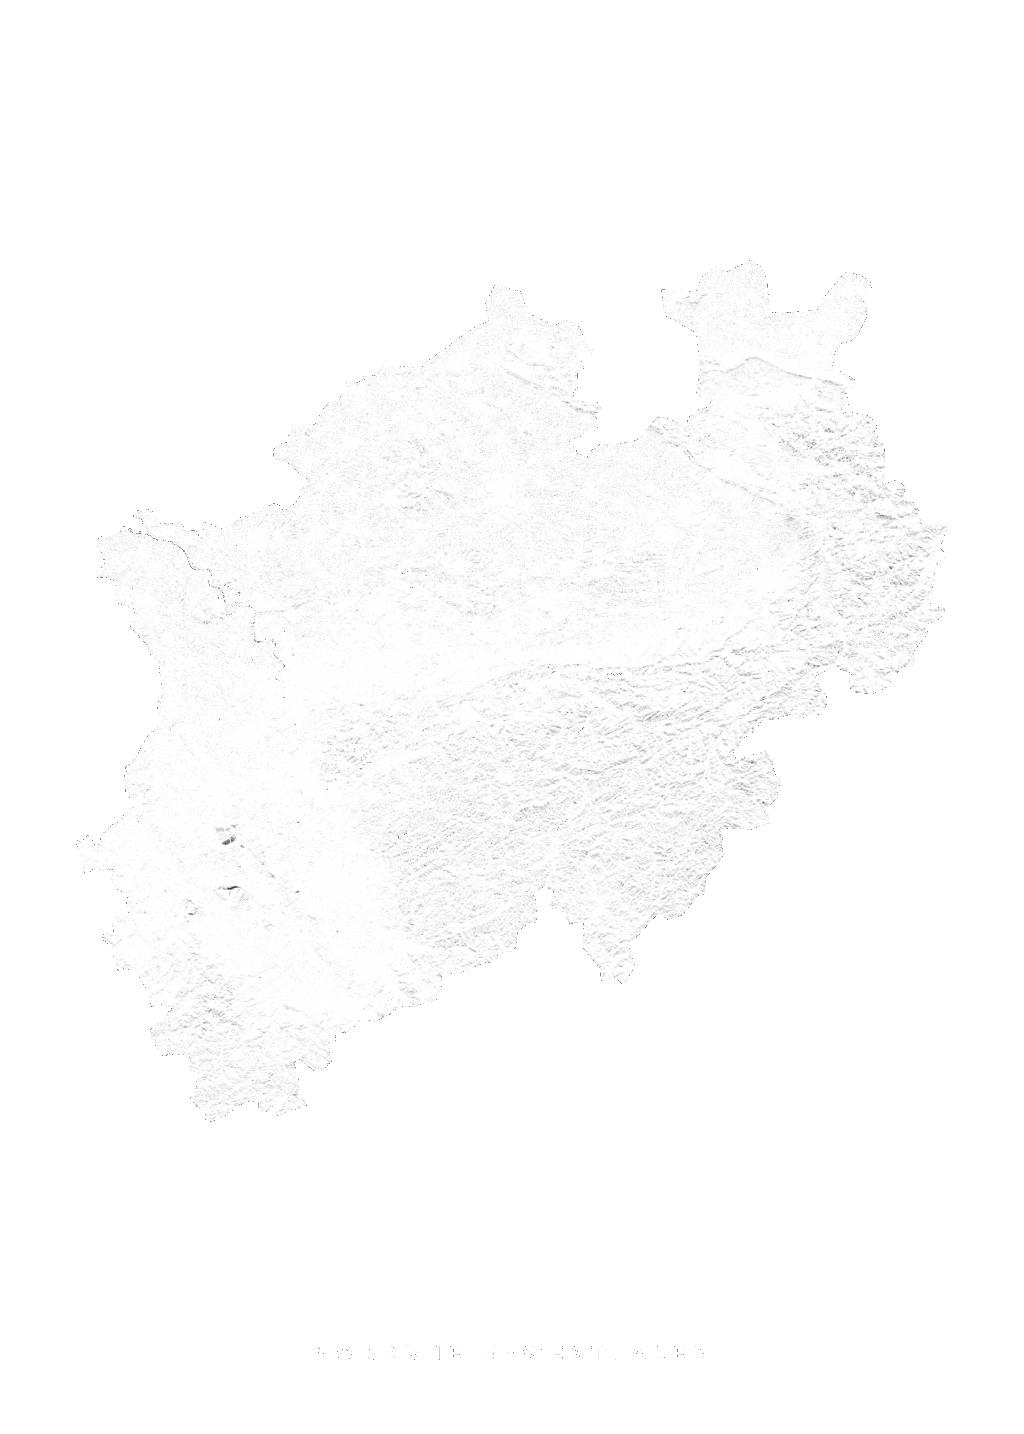 Nordrhein Westfalen wall map